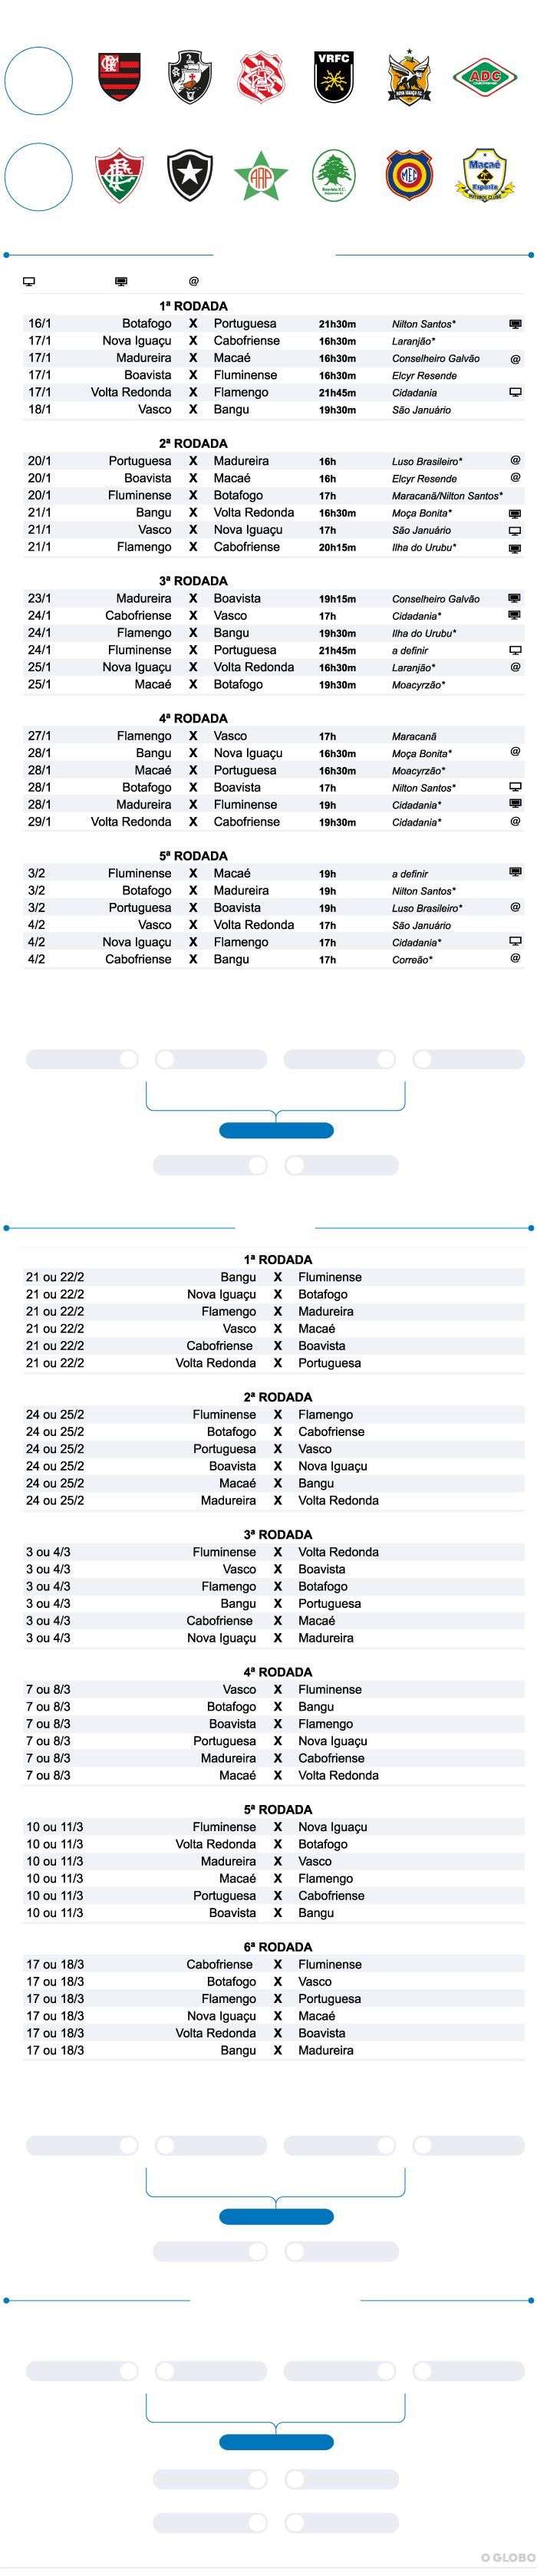 Tabela do campeonato carioca 2019